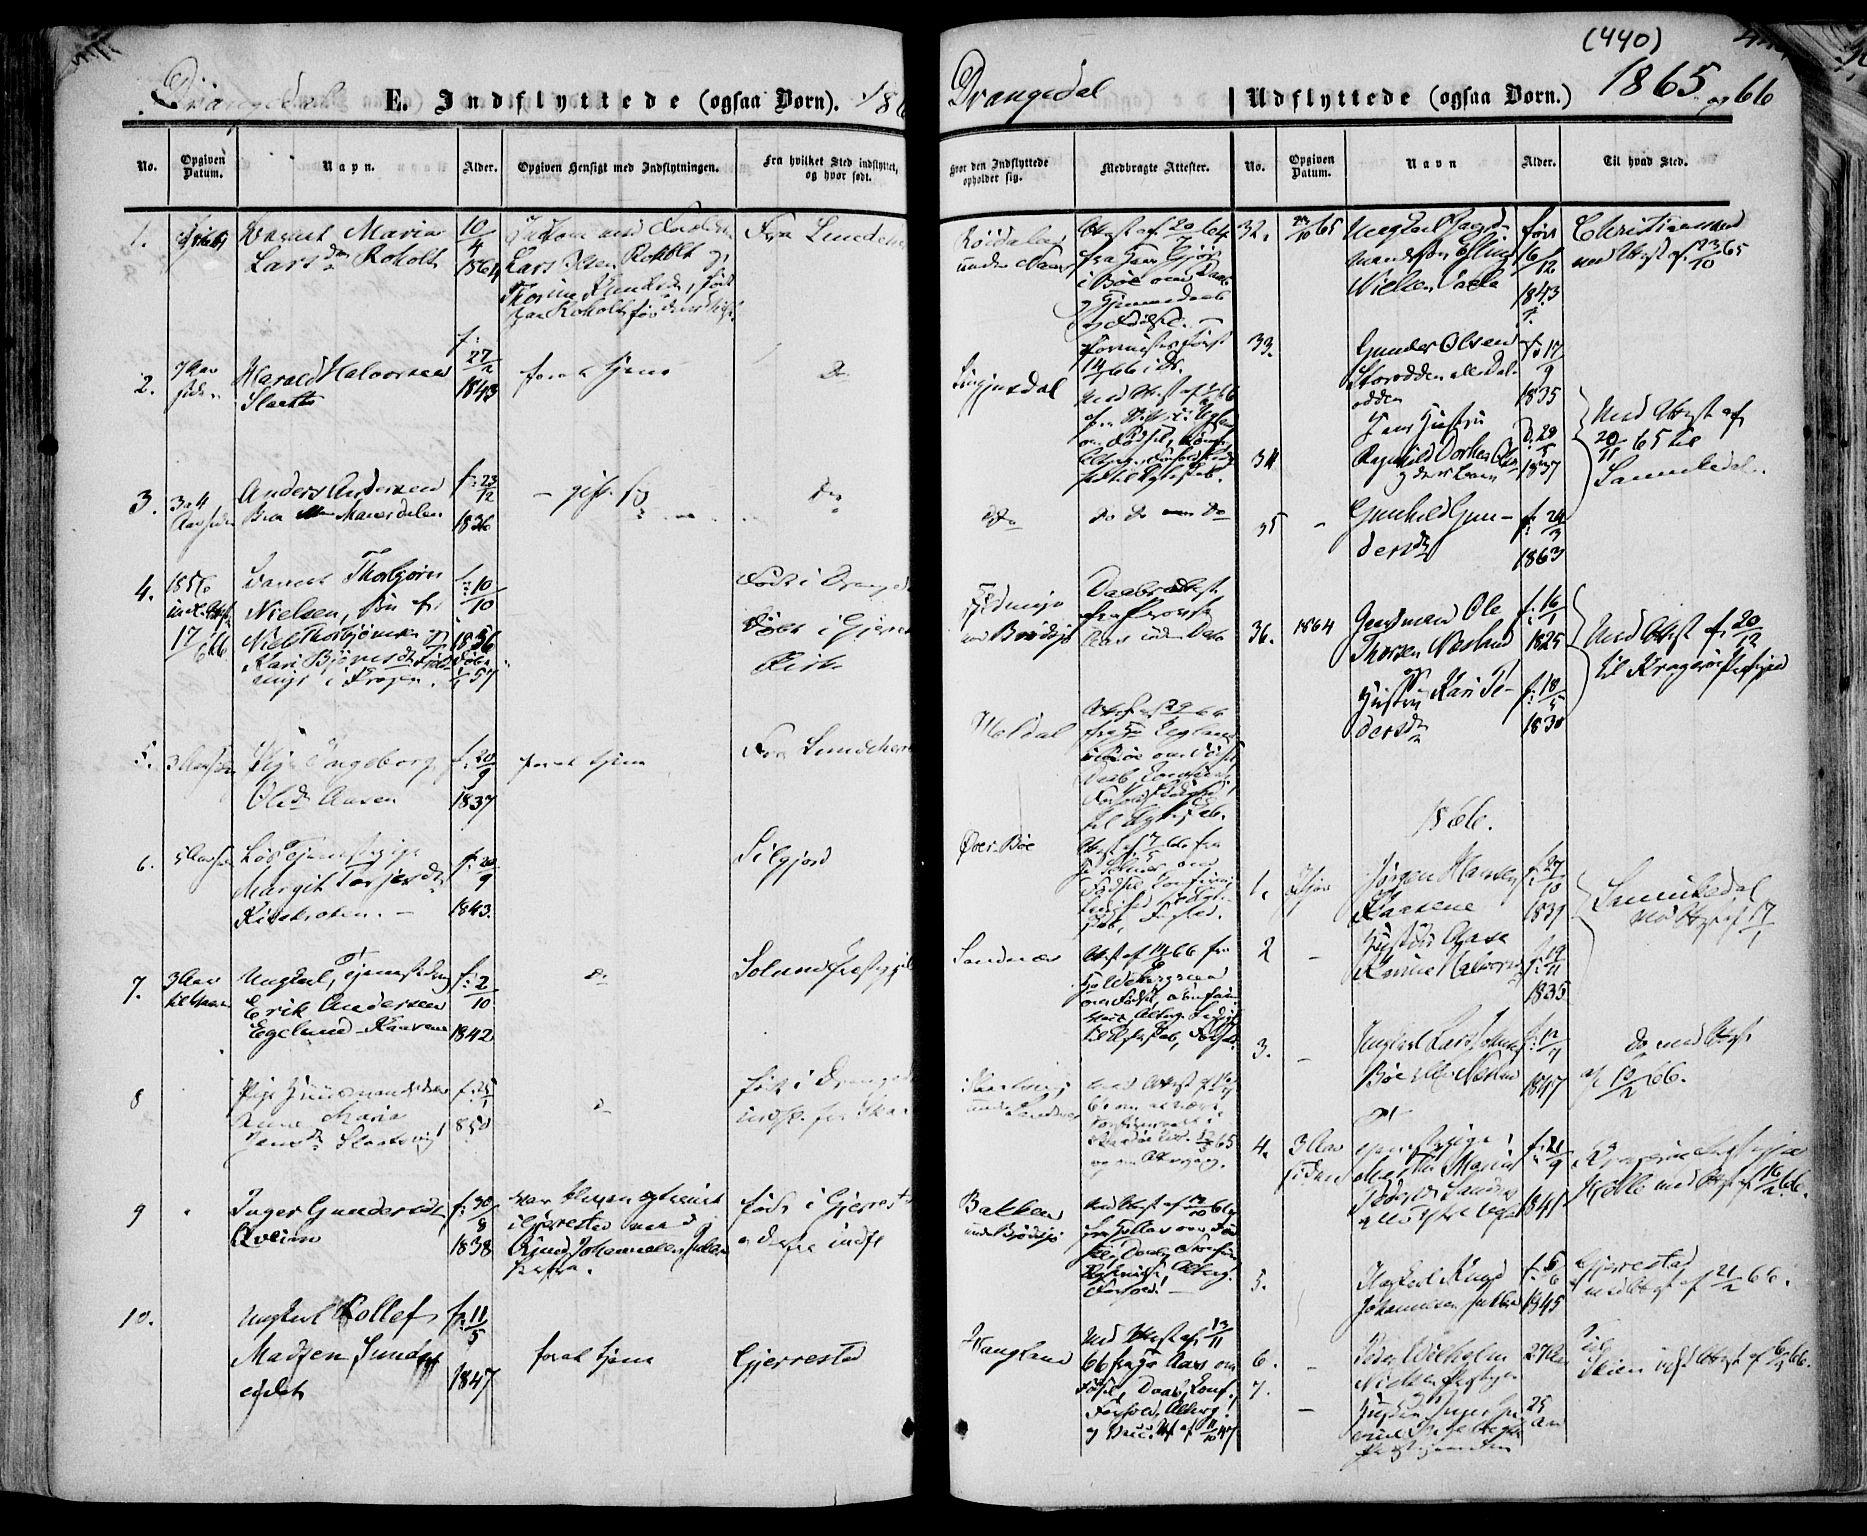 SAKO, Drangedal kirkebøker, F/Fa/L0008: Ministerialbok nr. 8, 1857-1871, s. 440